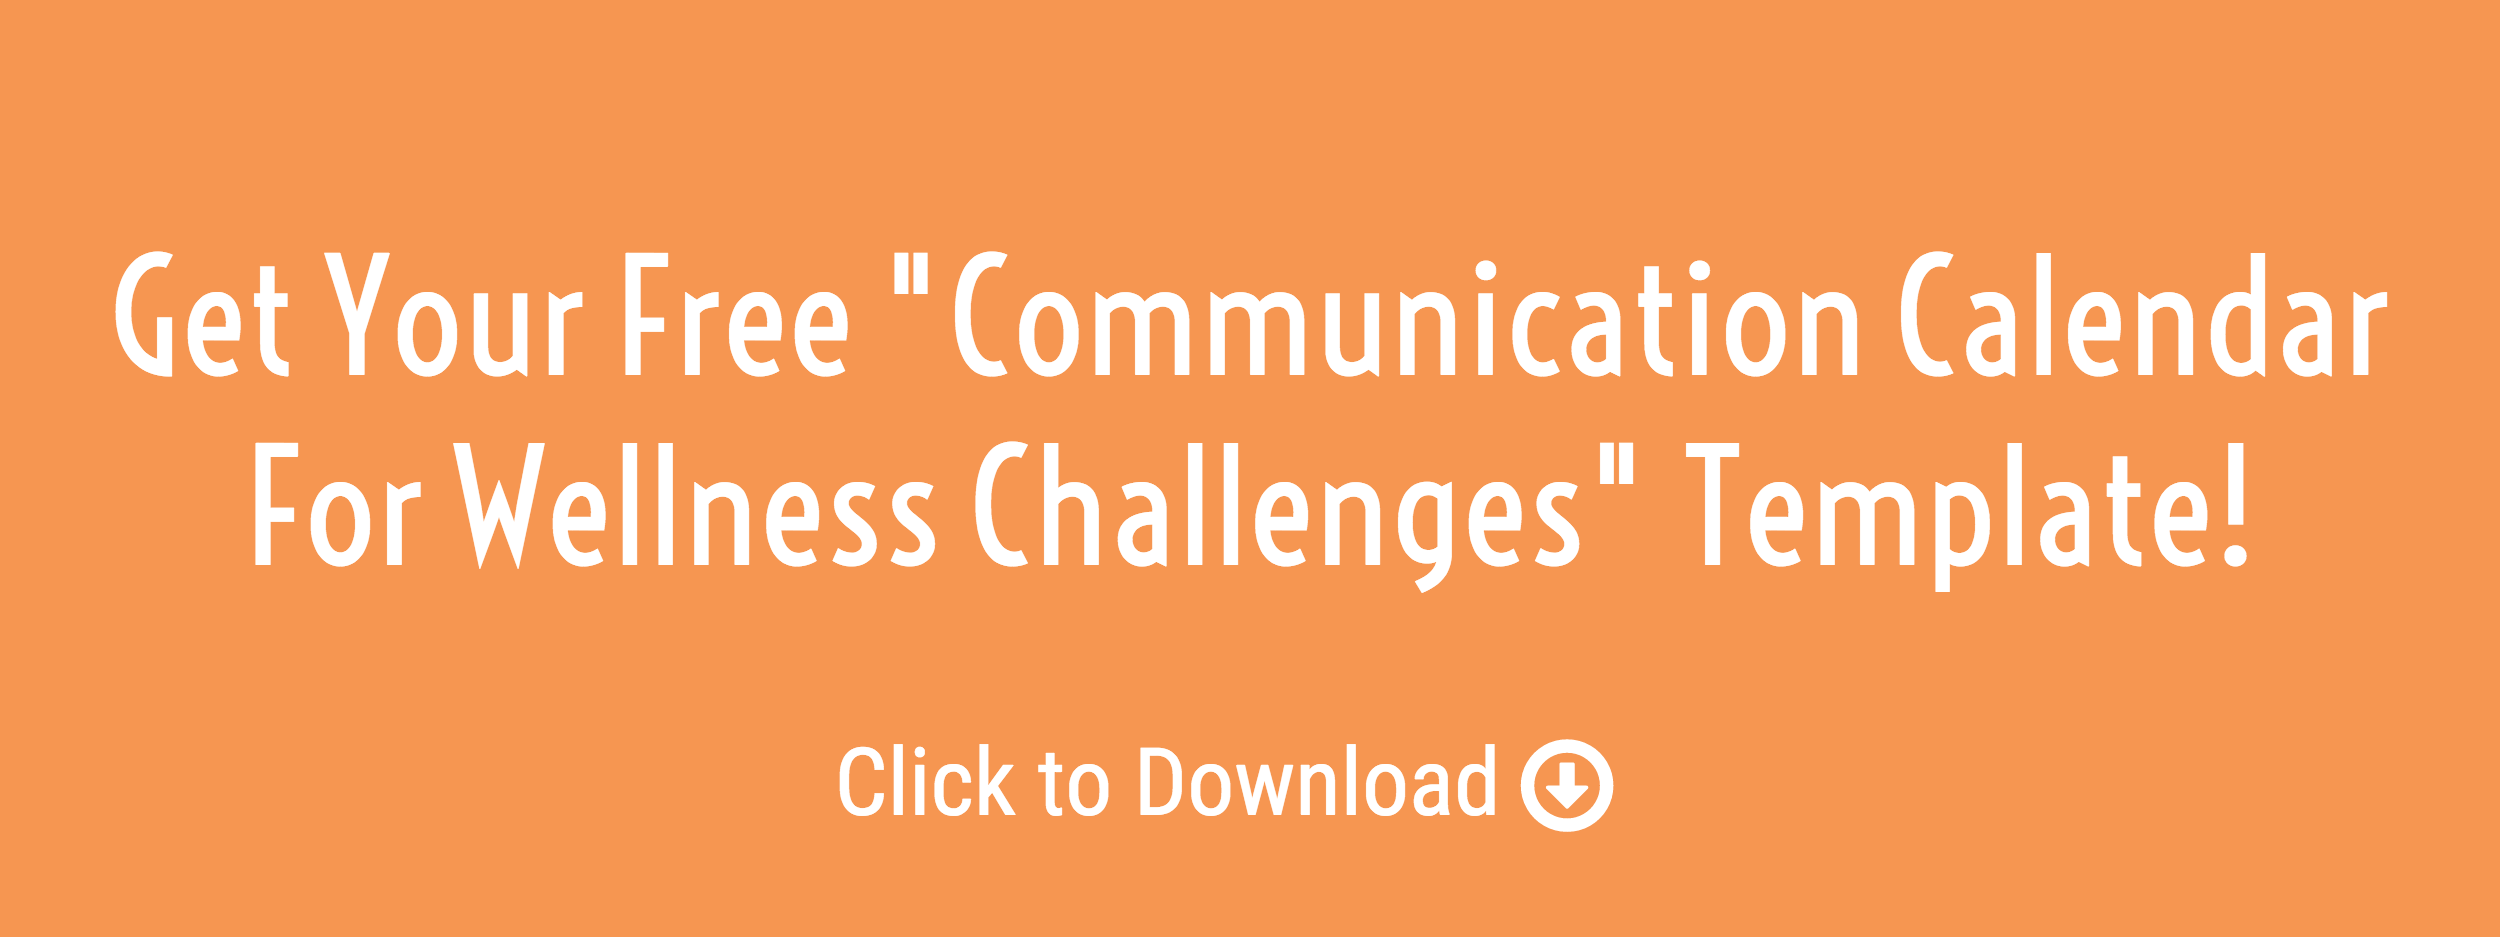 communication calendar for wellness challenges template